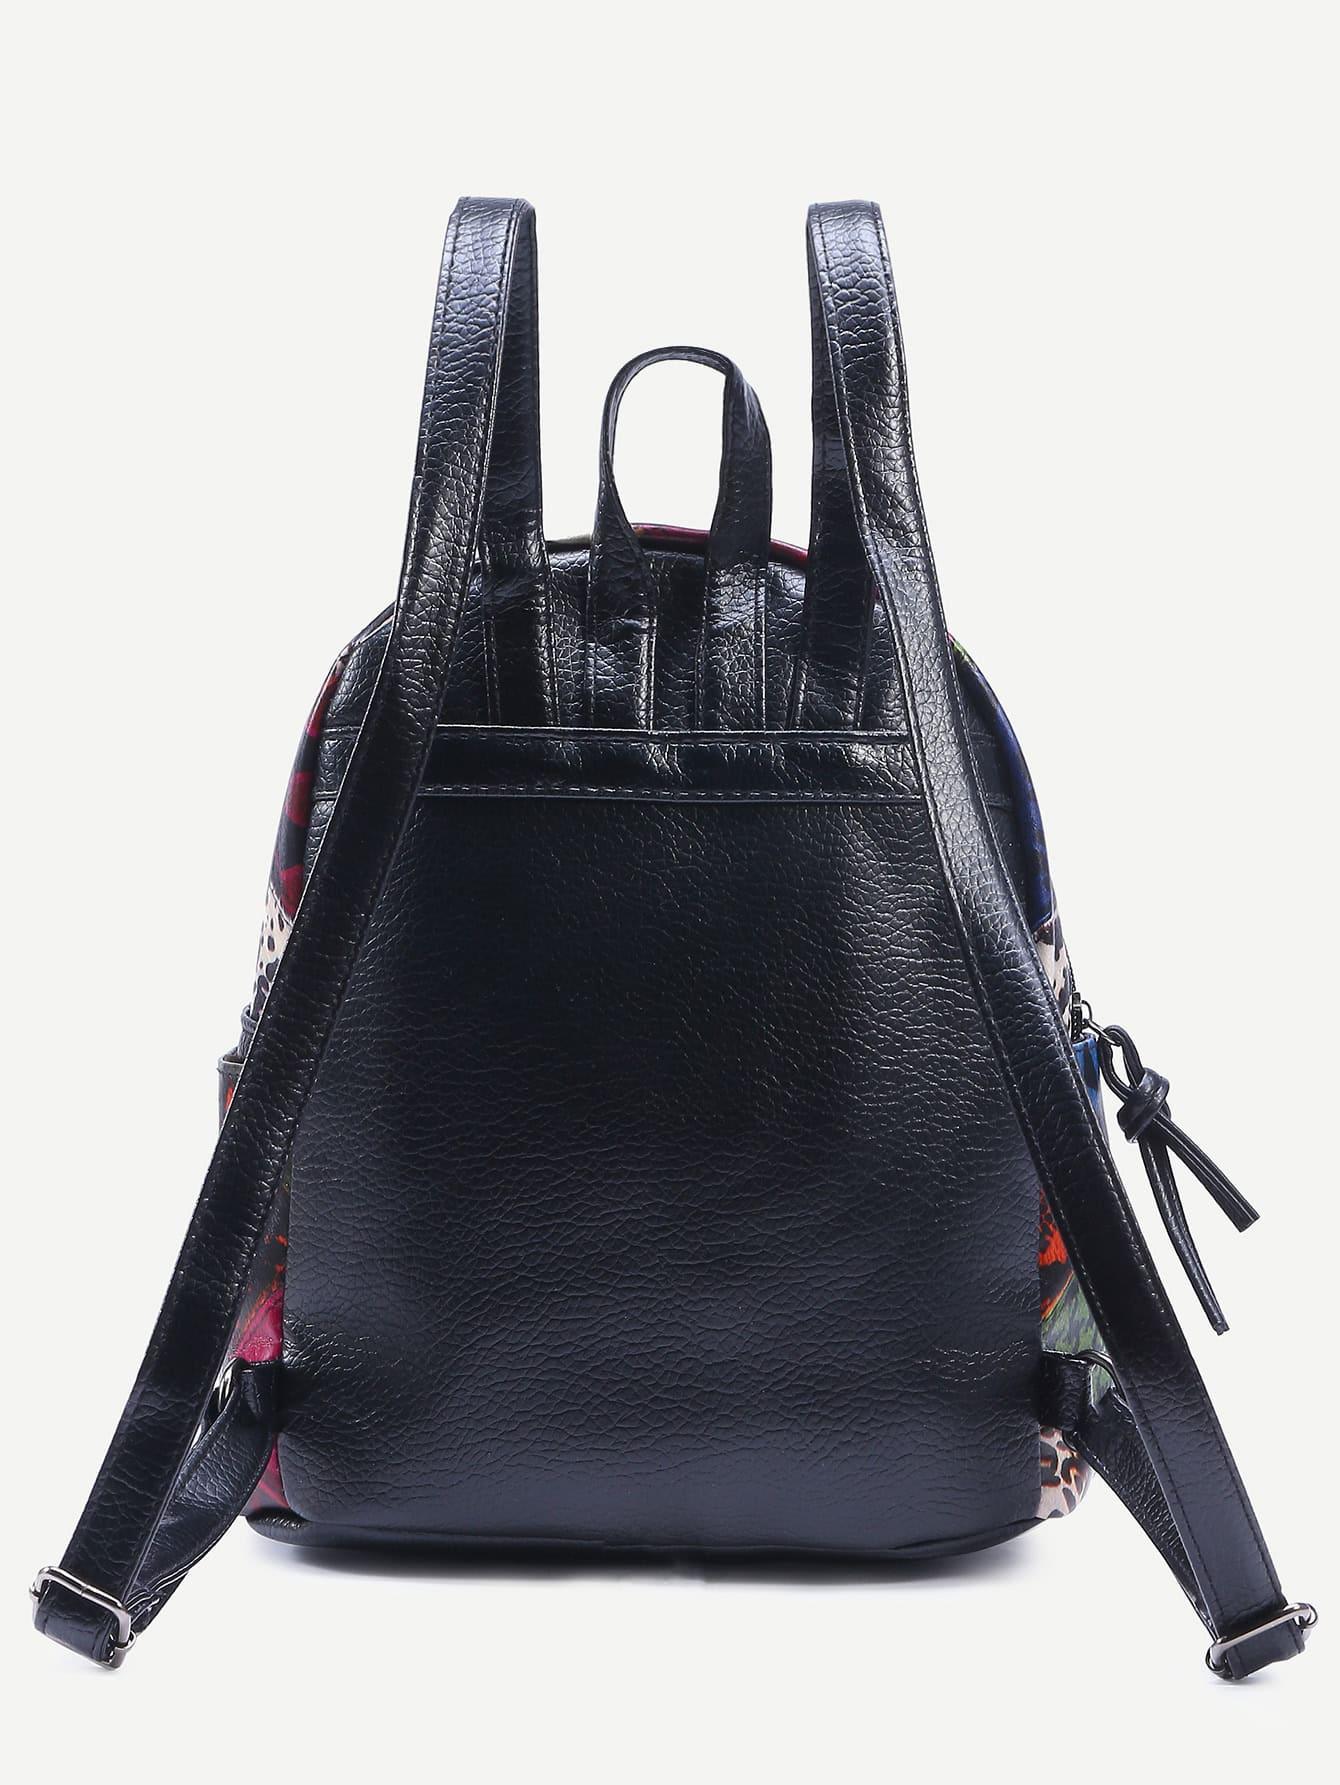 bag160811907_2